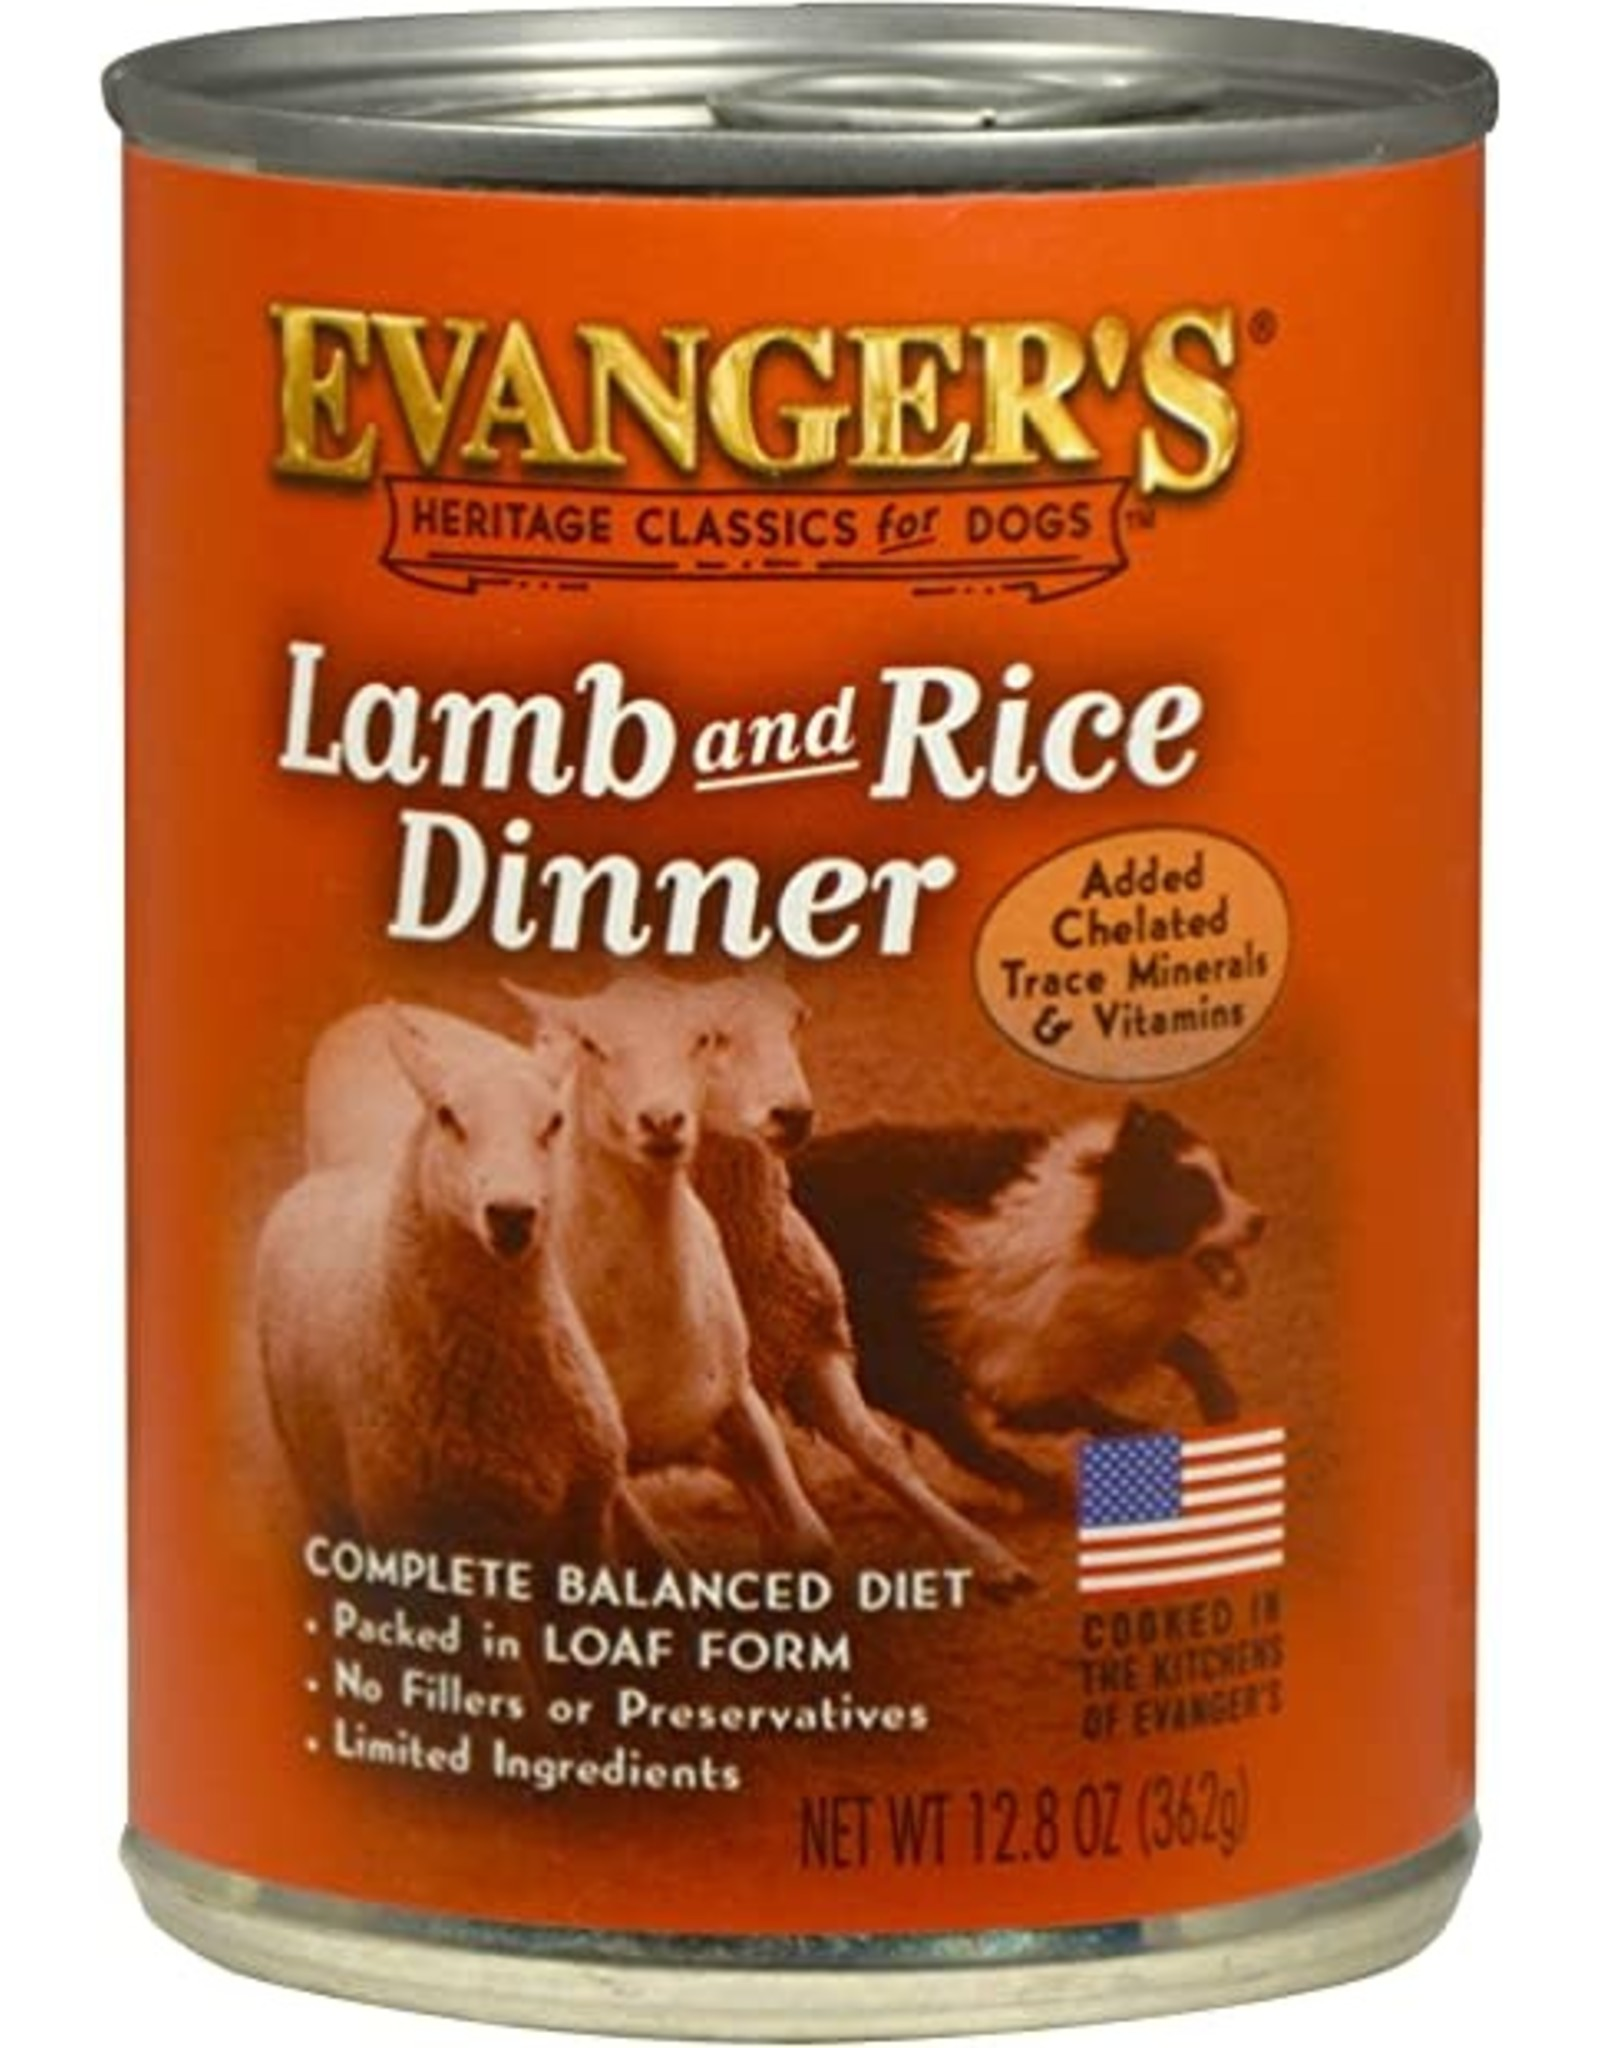 Evangers Evanger's Classic Lamb & Rice Dog Food 12.5oz